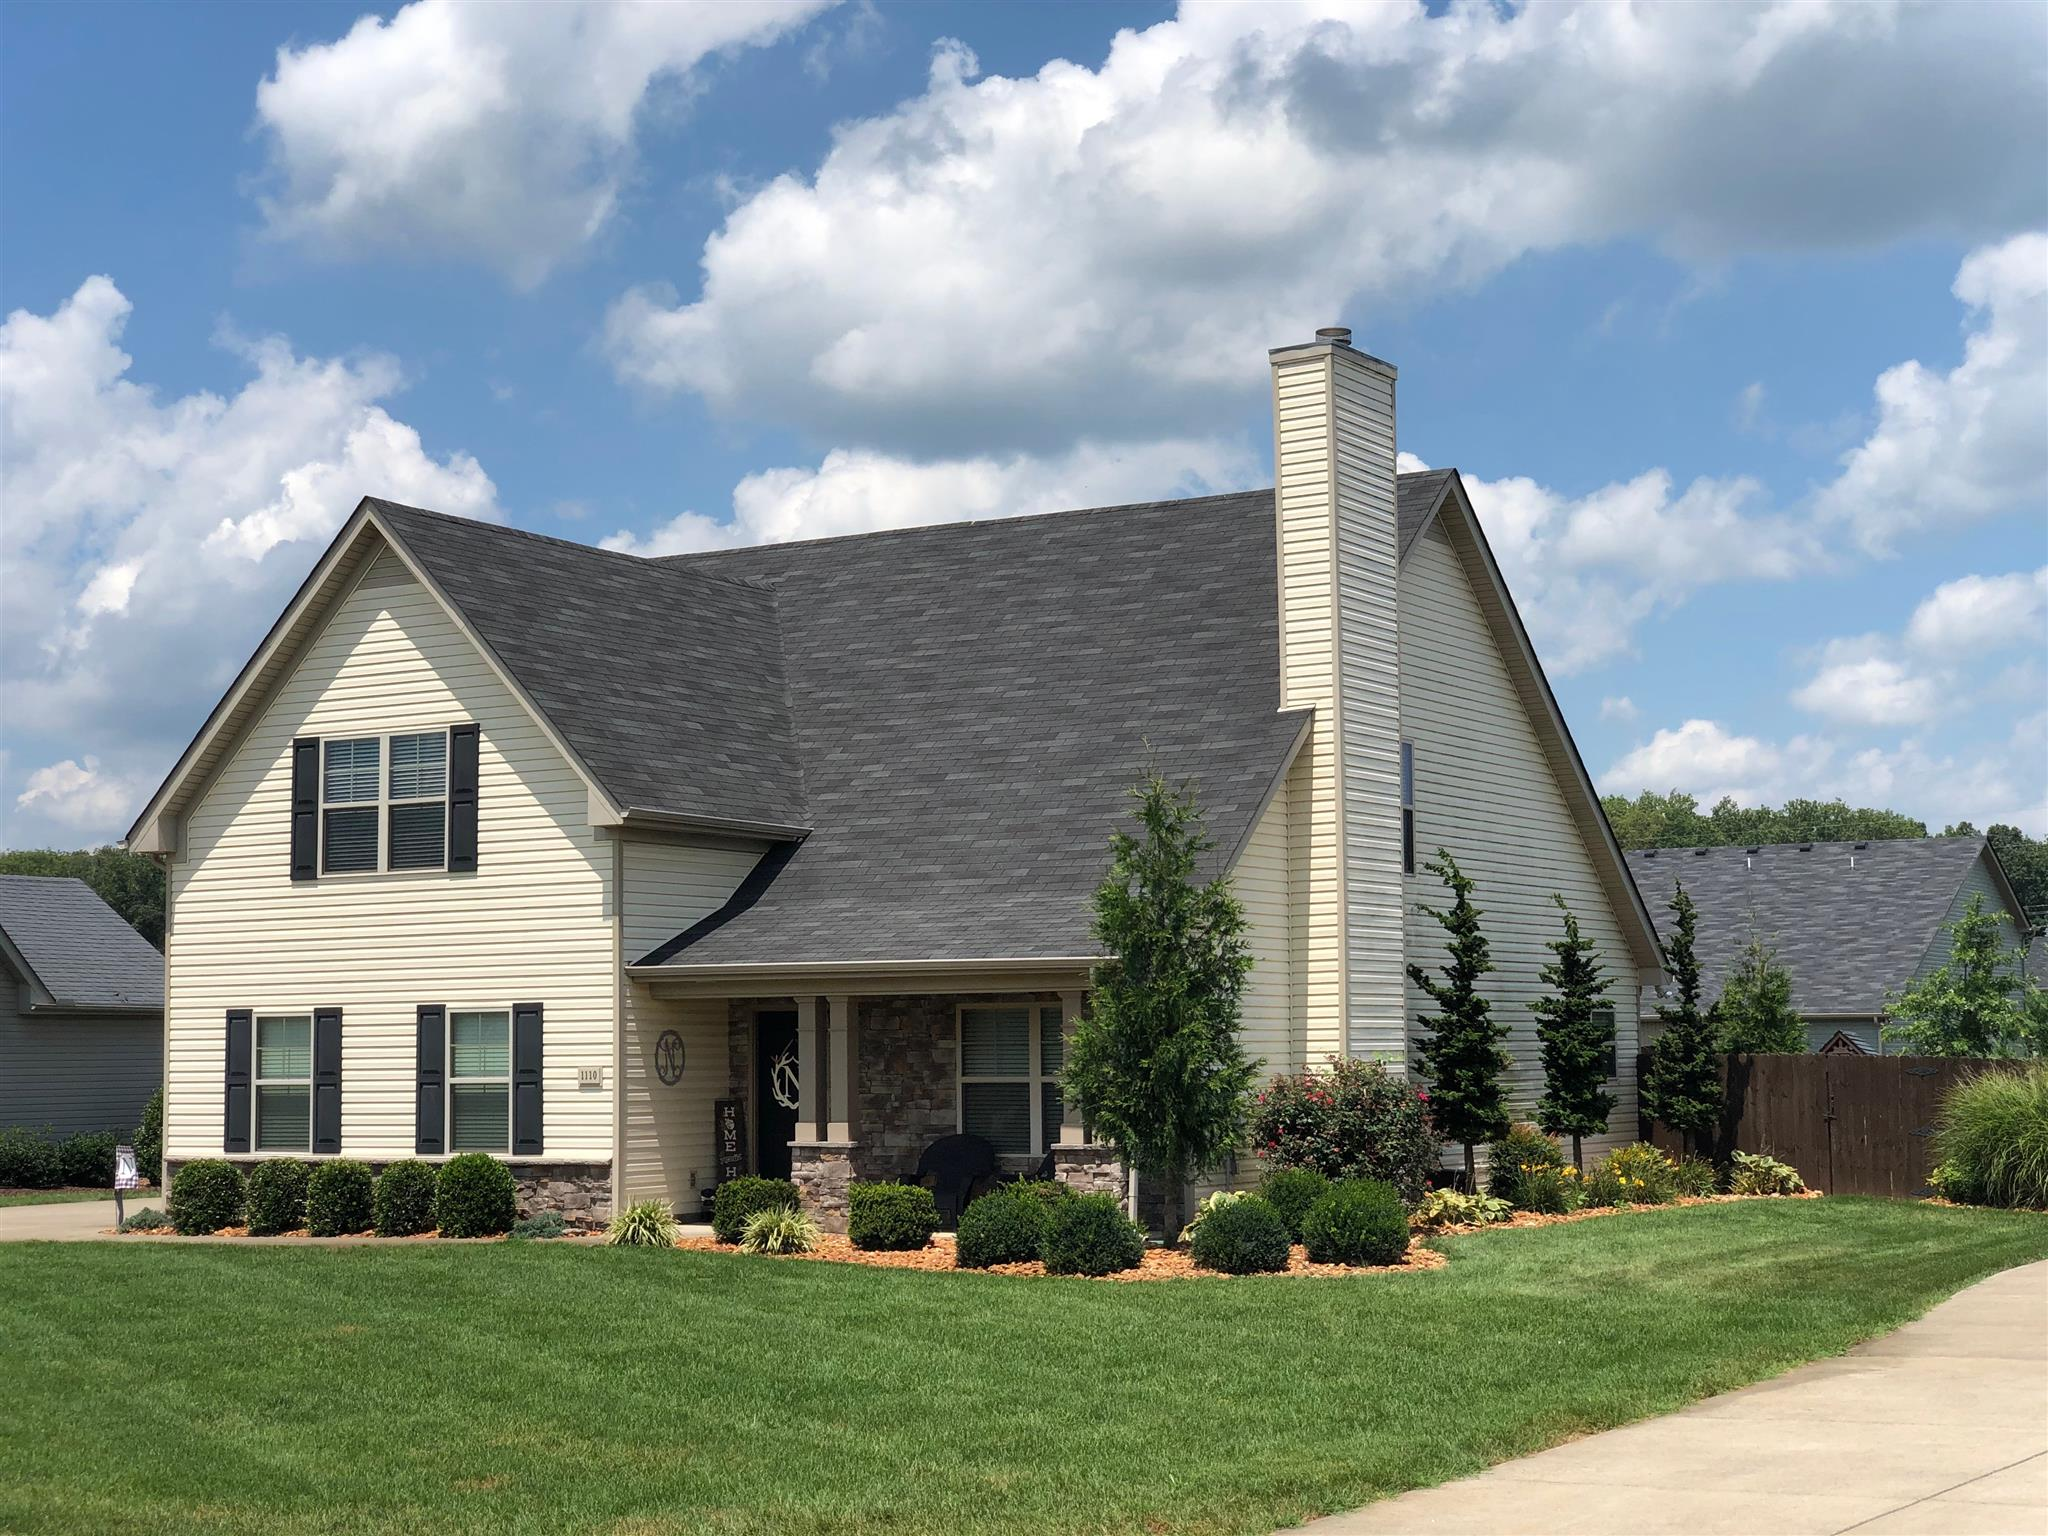 1110 Pinnacle Hills Dr, Murfreesboro, TN 37128 - Murfreesboro, TN real estate listing